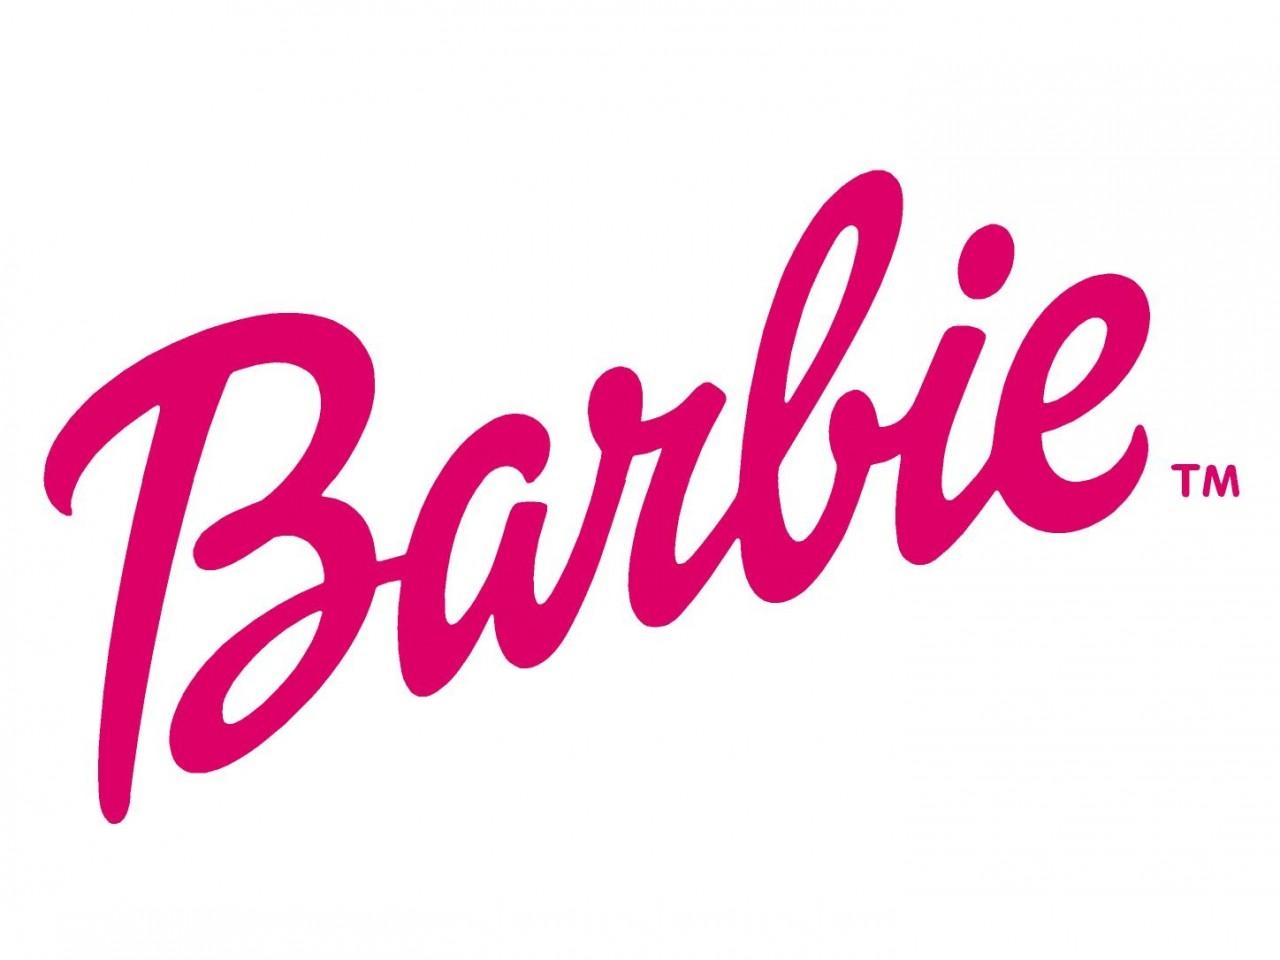 barbie head logo wallpaper Pics For Barbie Logo Wallpaper Pink